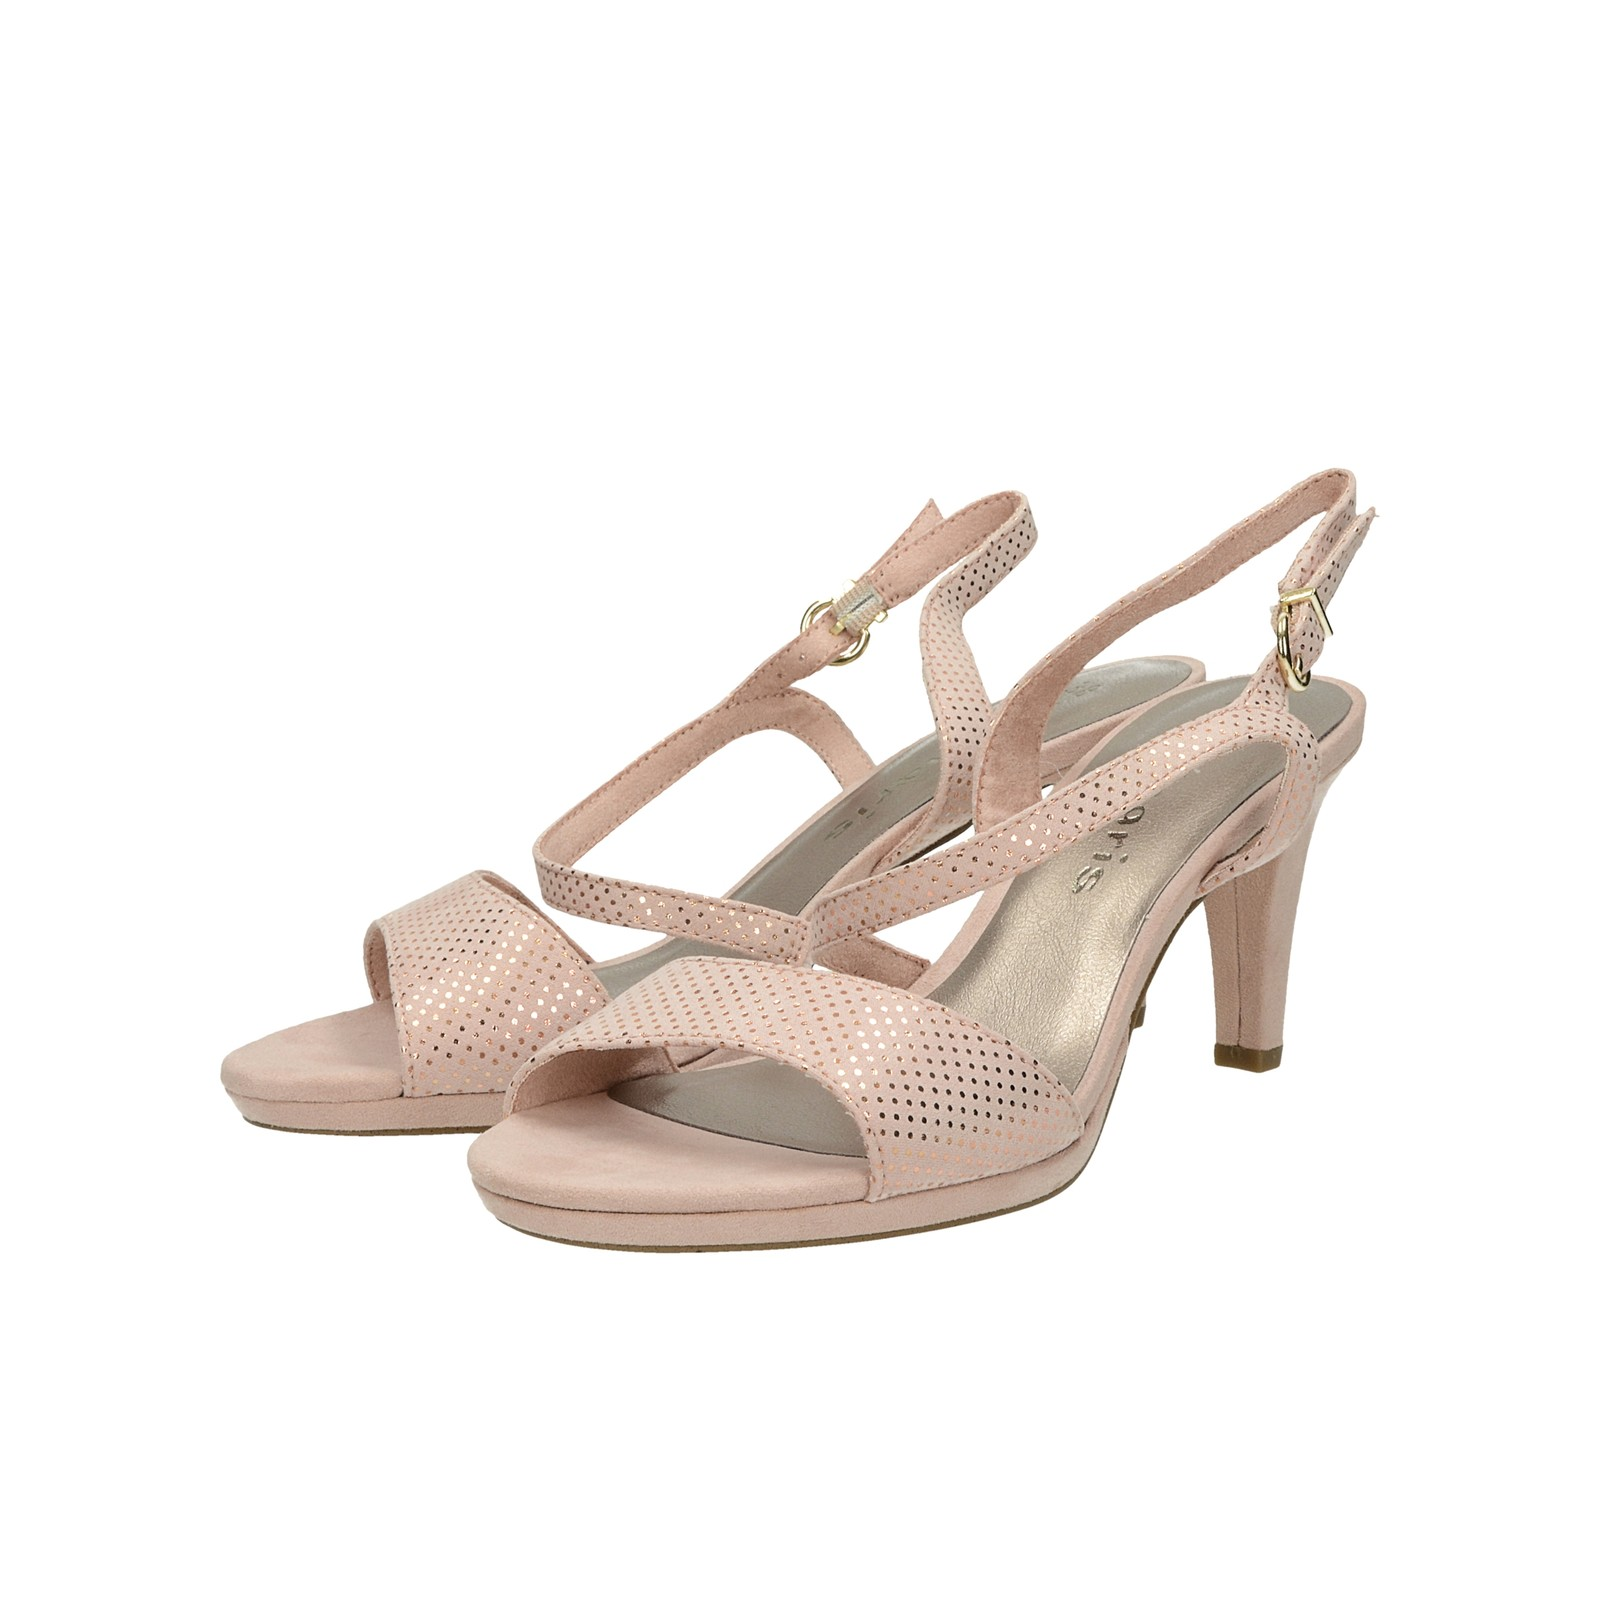 109f1d90a4 Tamaris dámske sandále s remienkom - ružové ...